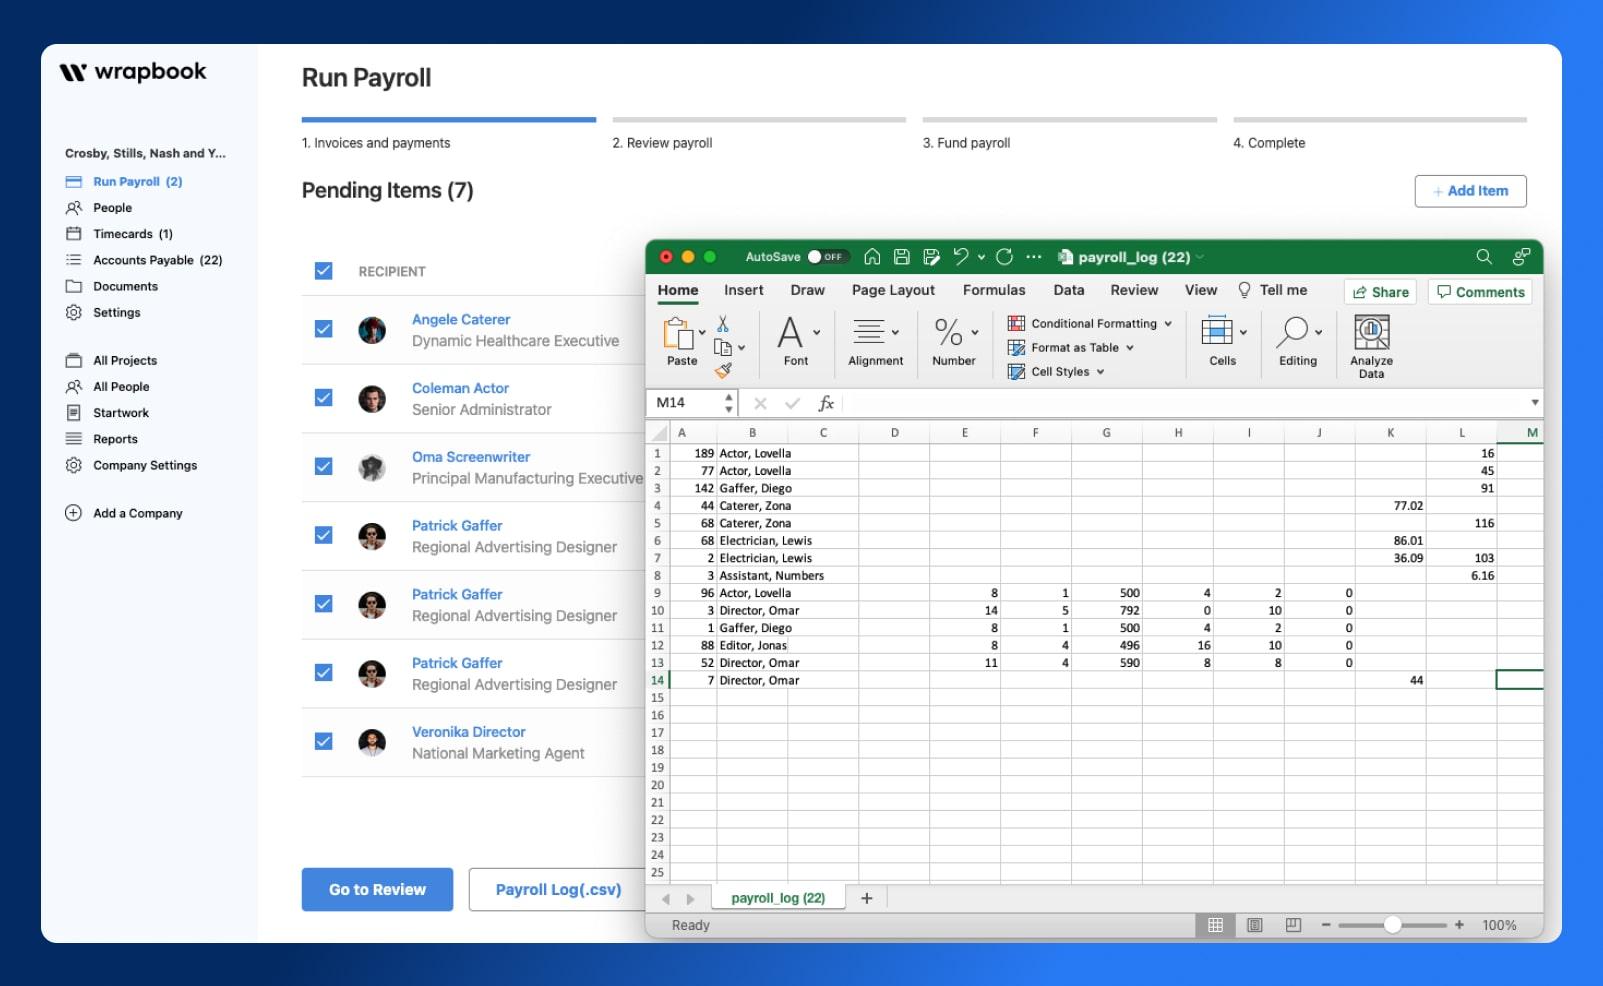 Actualize Budgets - CSV View - Wrapbook